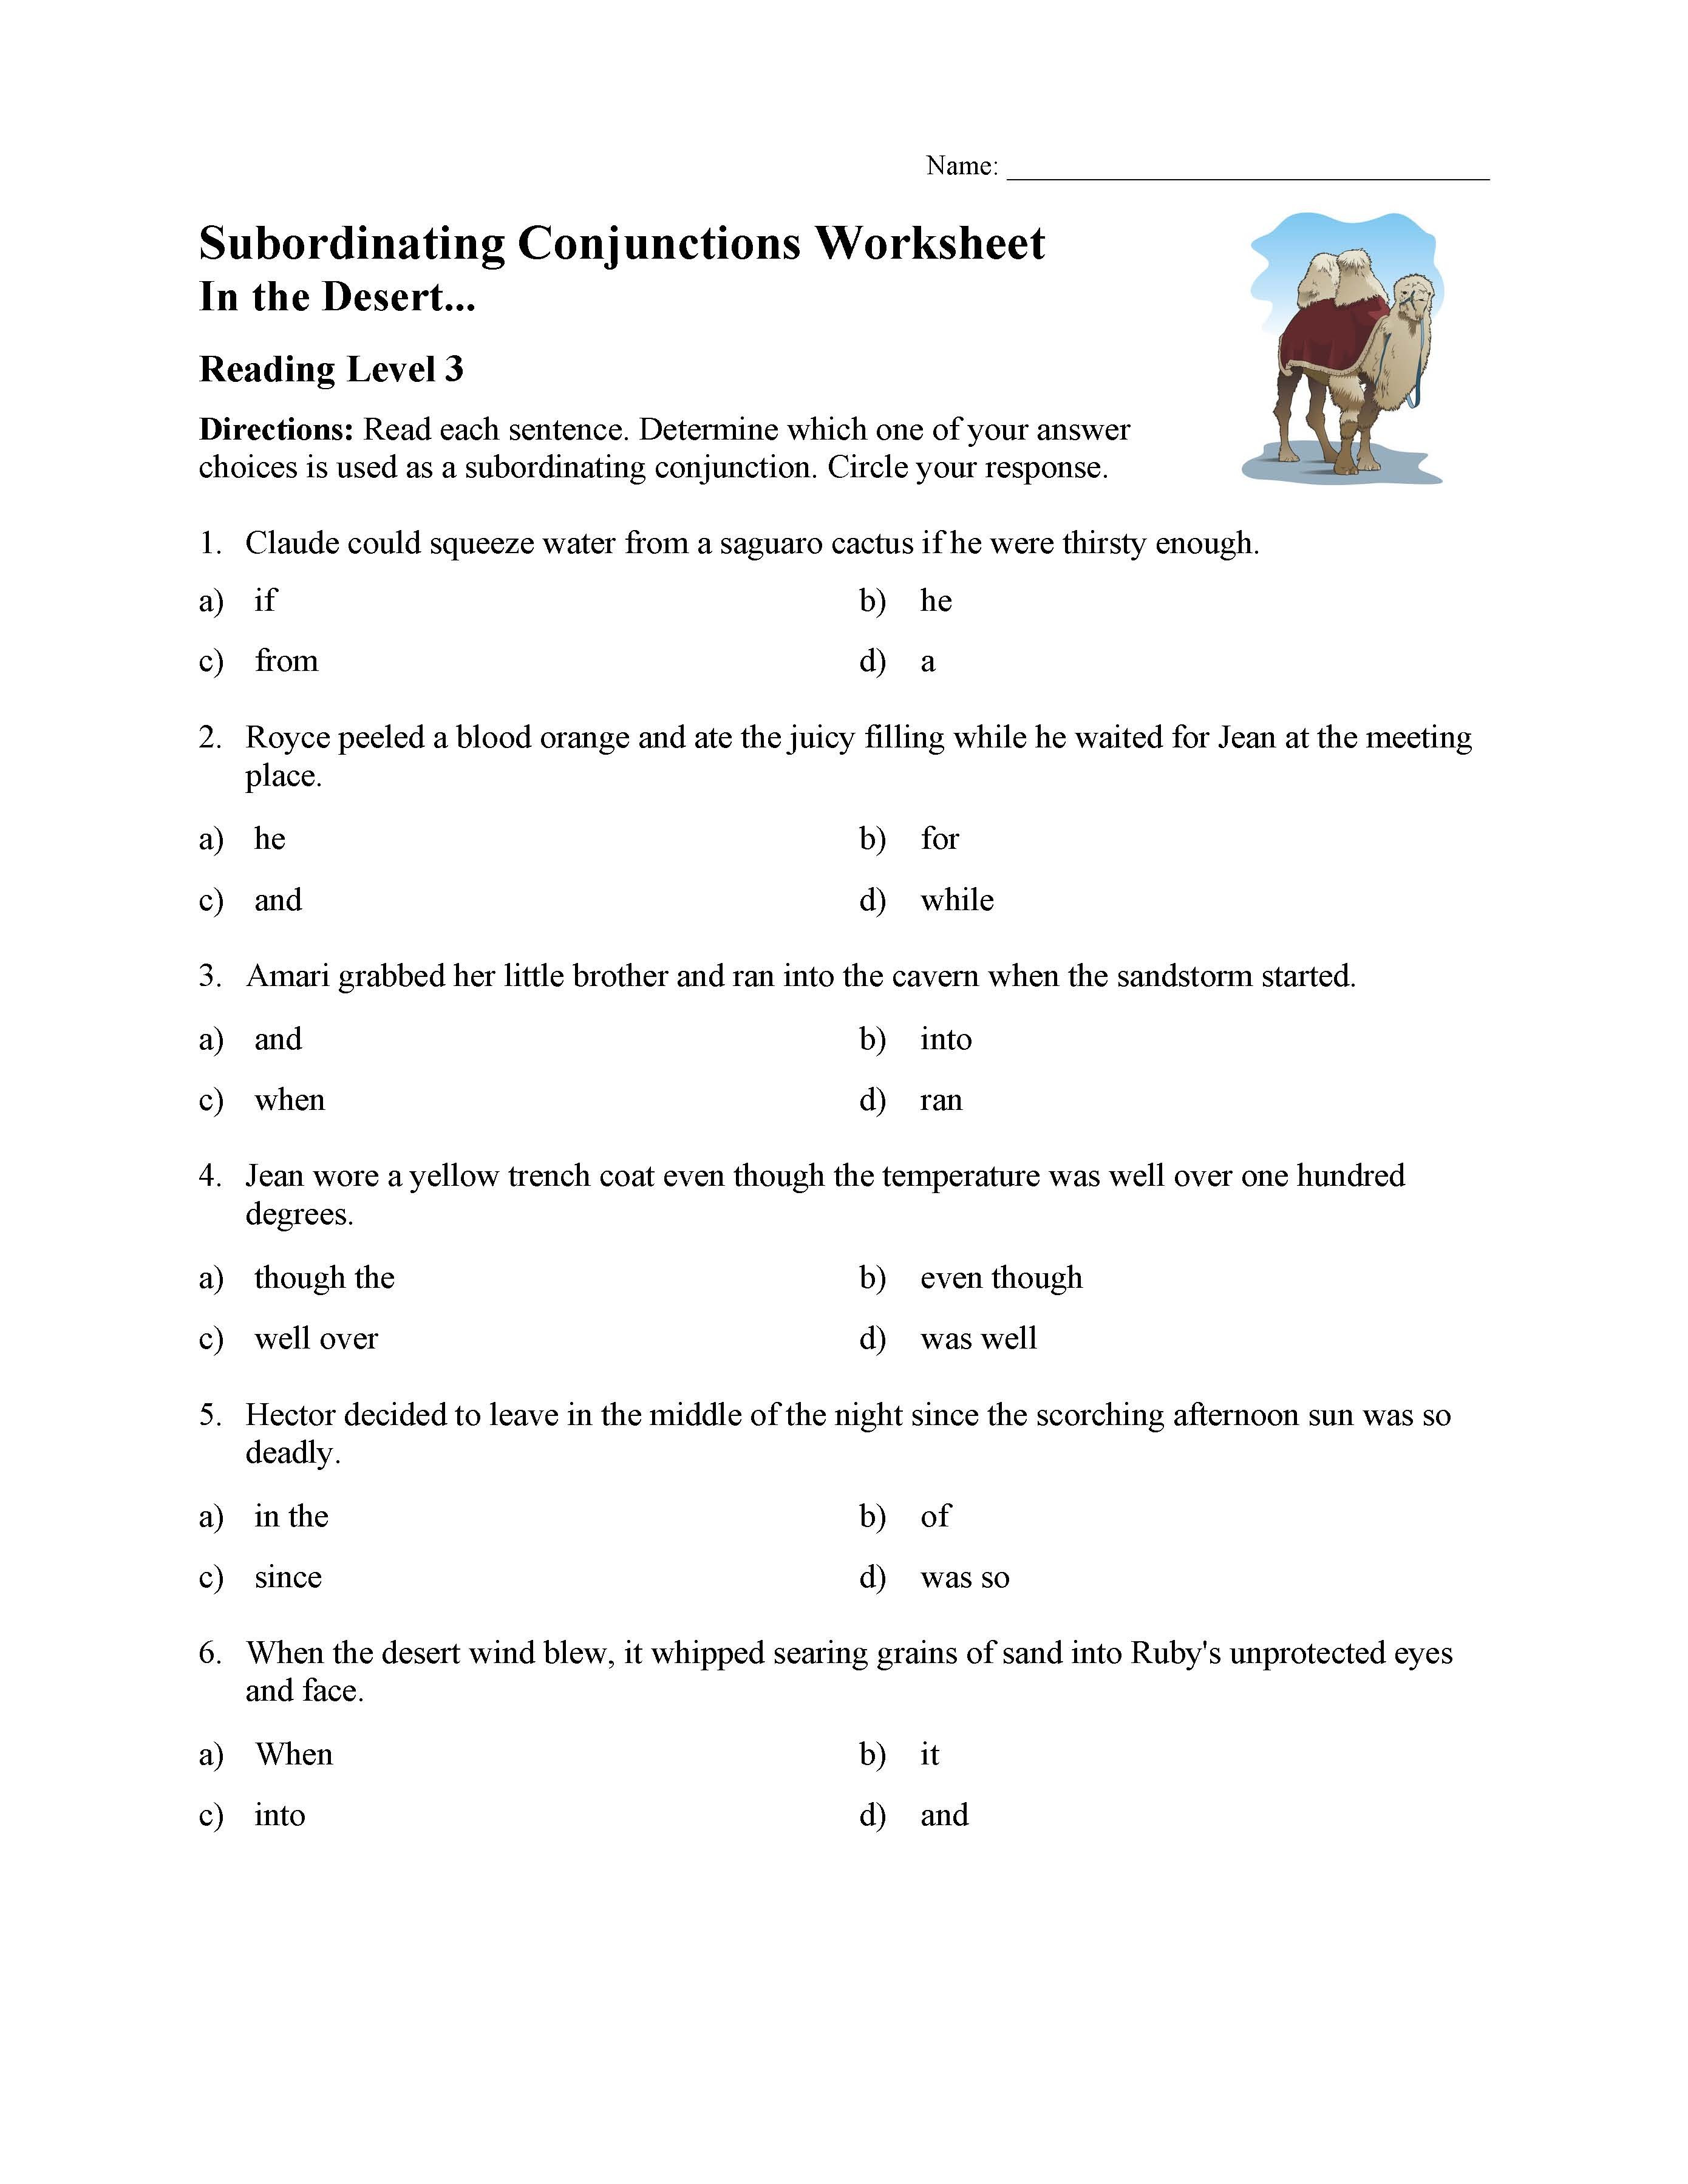 Conjunctions Worksheets for Grade 3 Subordinating Conjunctions Worksheet Reading Level 3